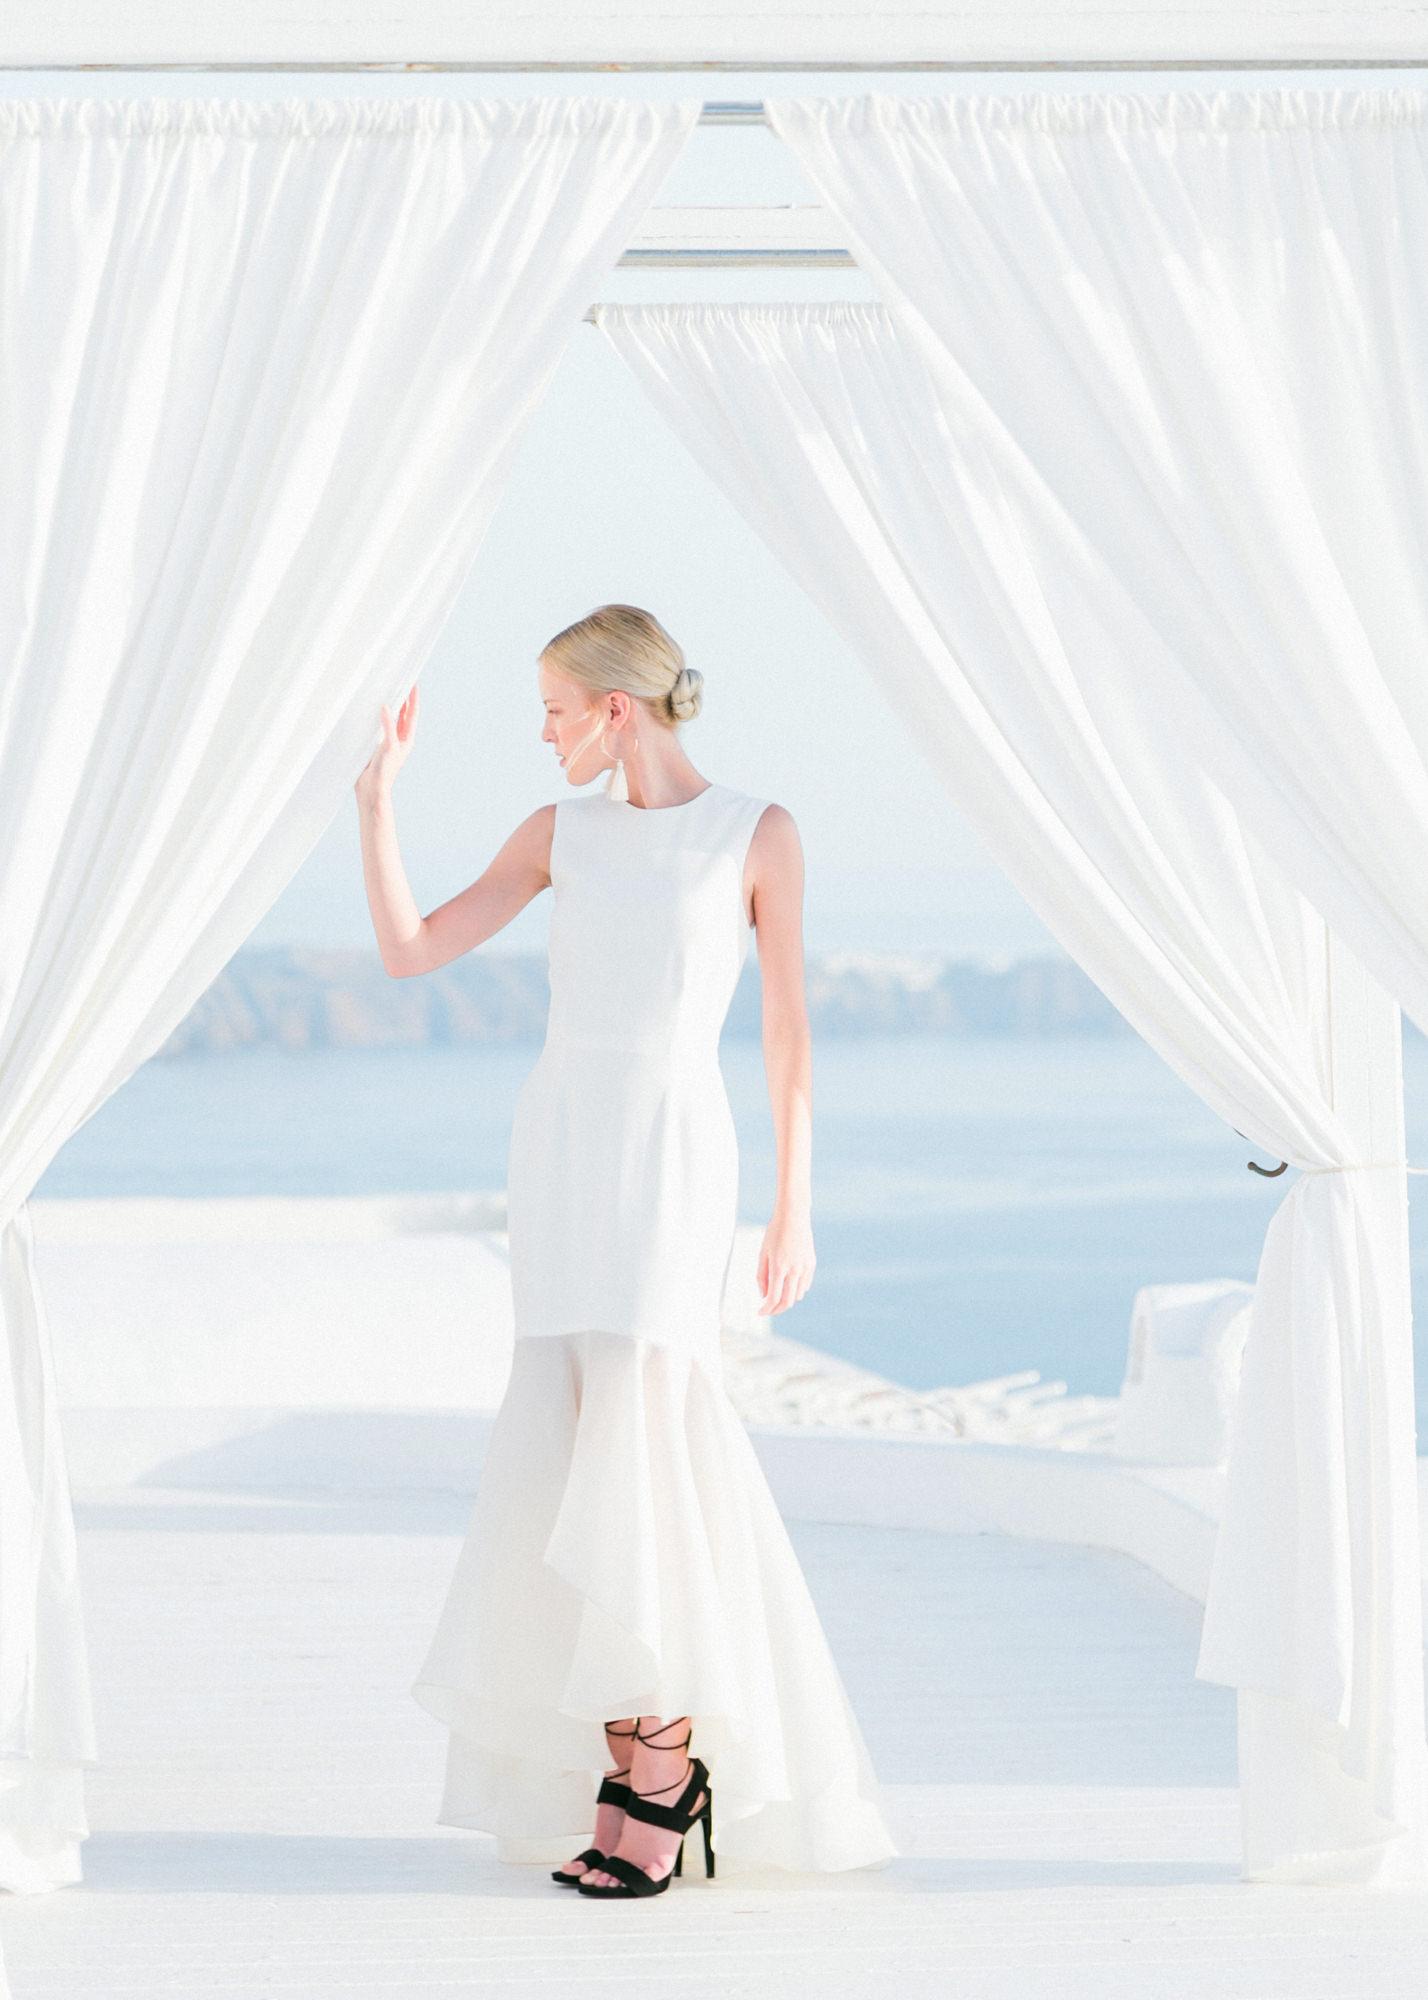 55-portrait-santorini-wedding-photographer-greece-b-v